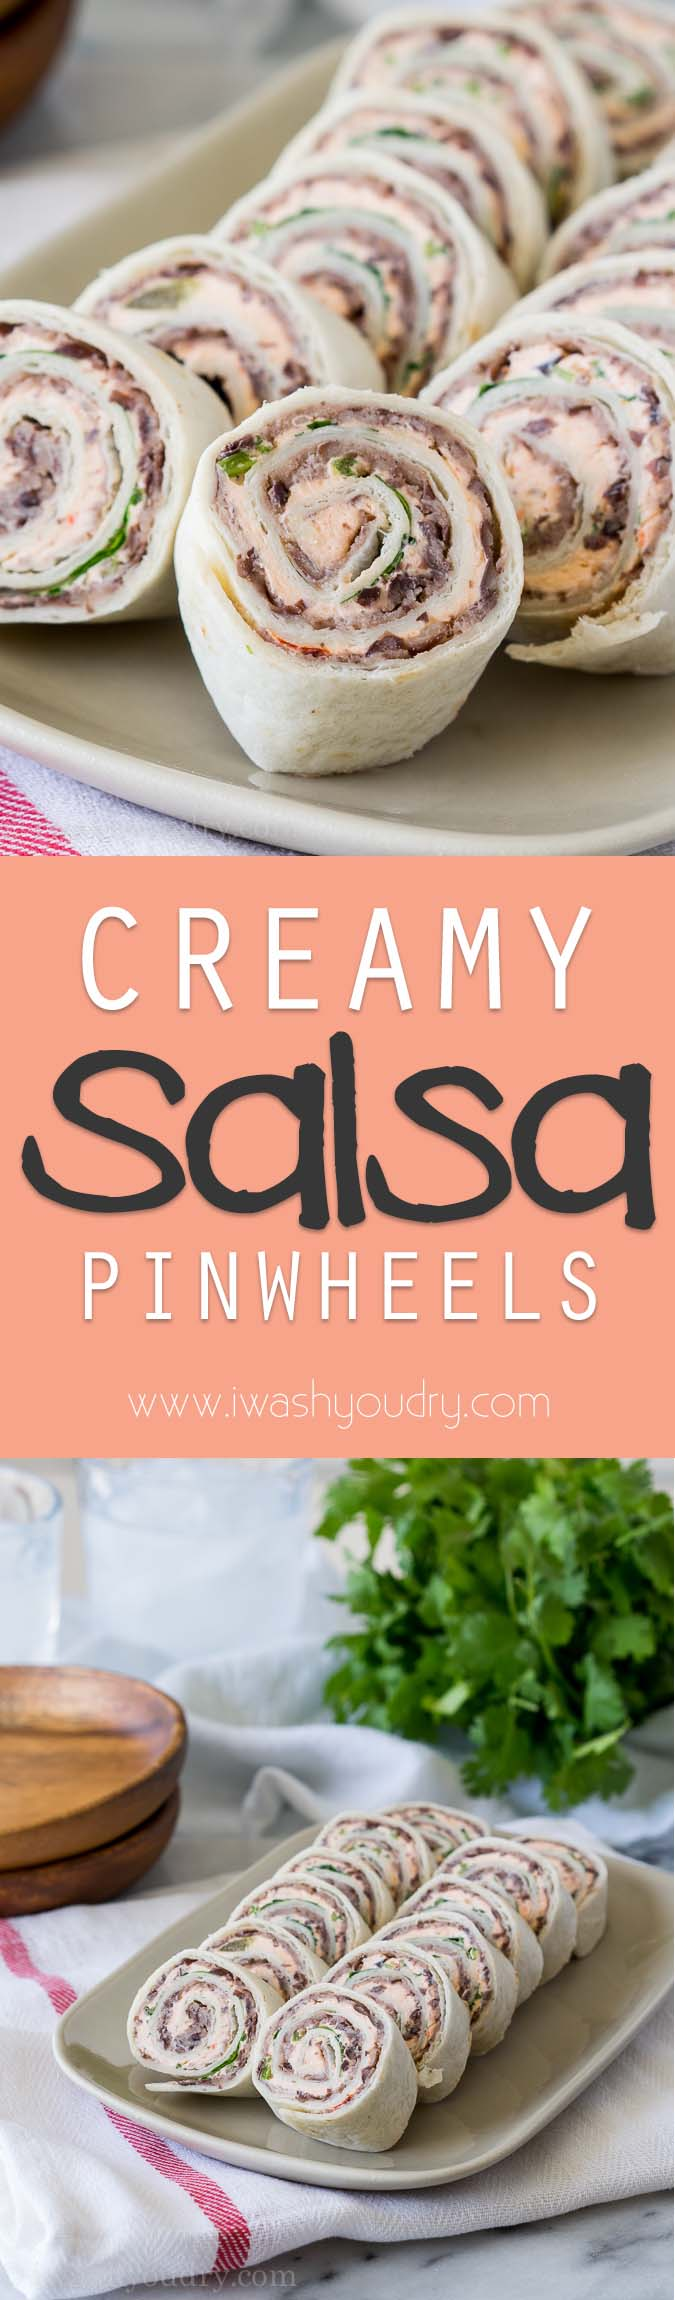 Super easy 4 ingredient Creamy Salsa Pinwheels!